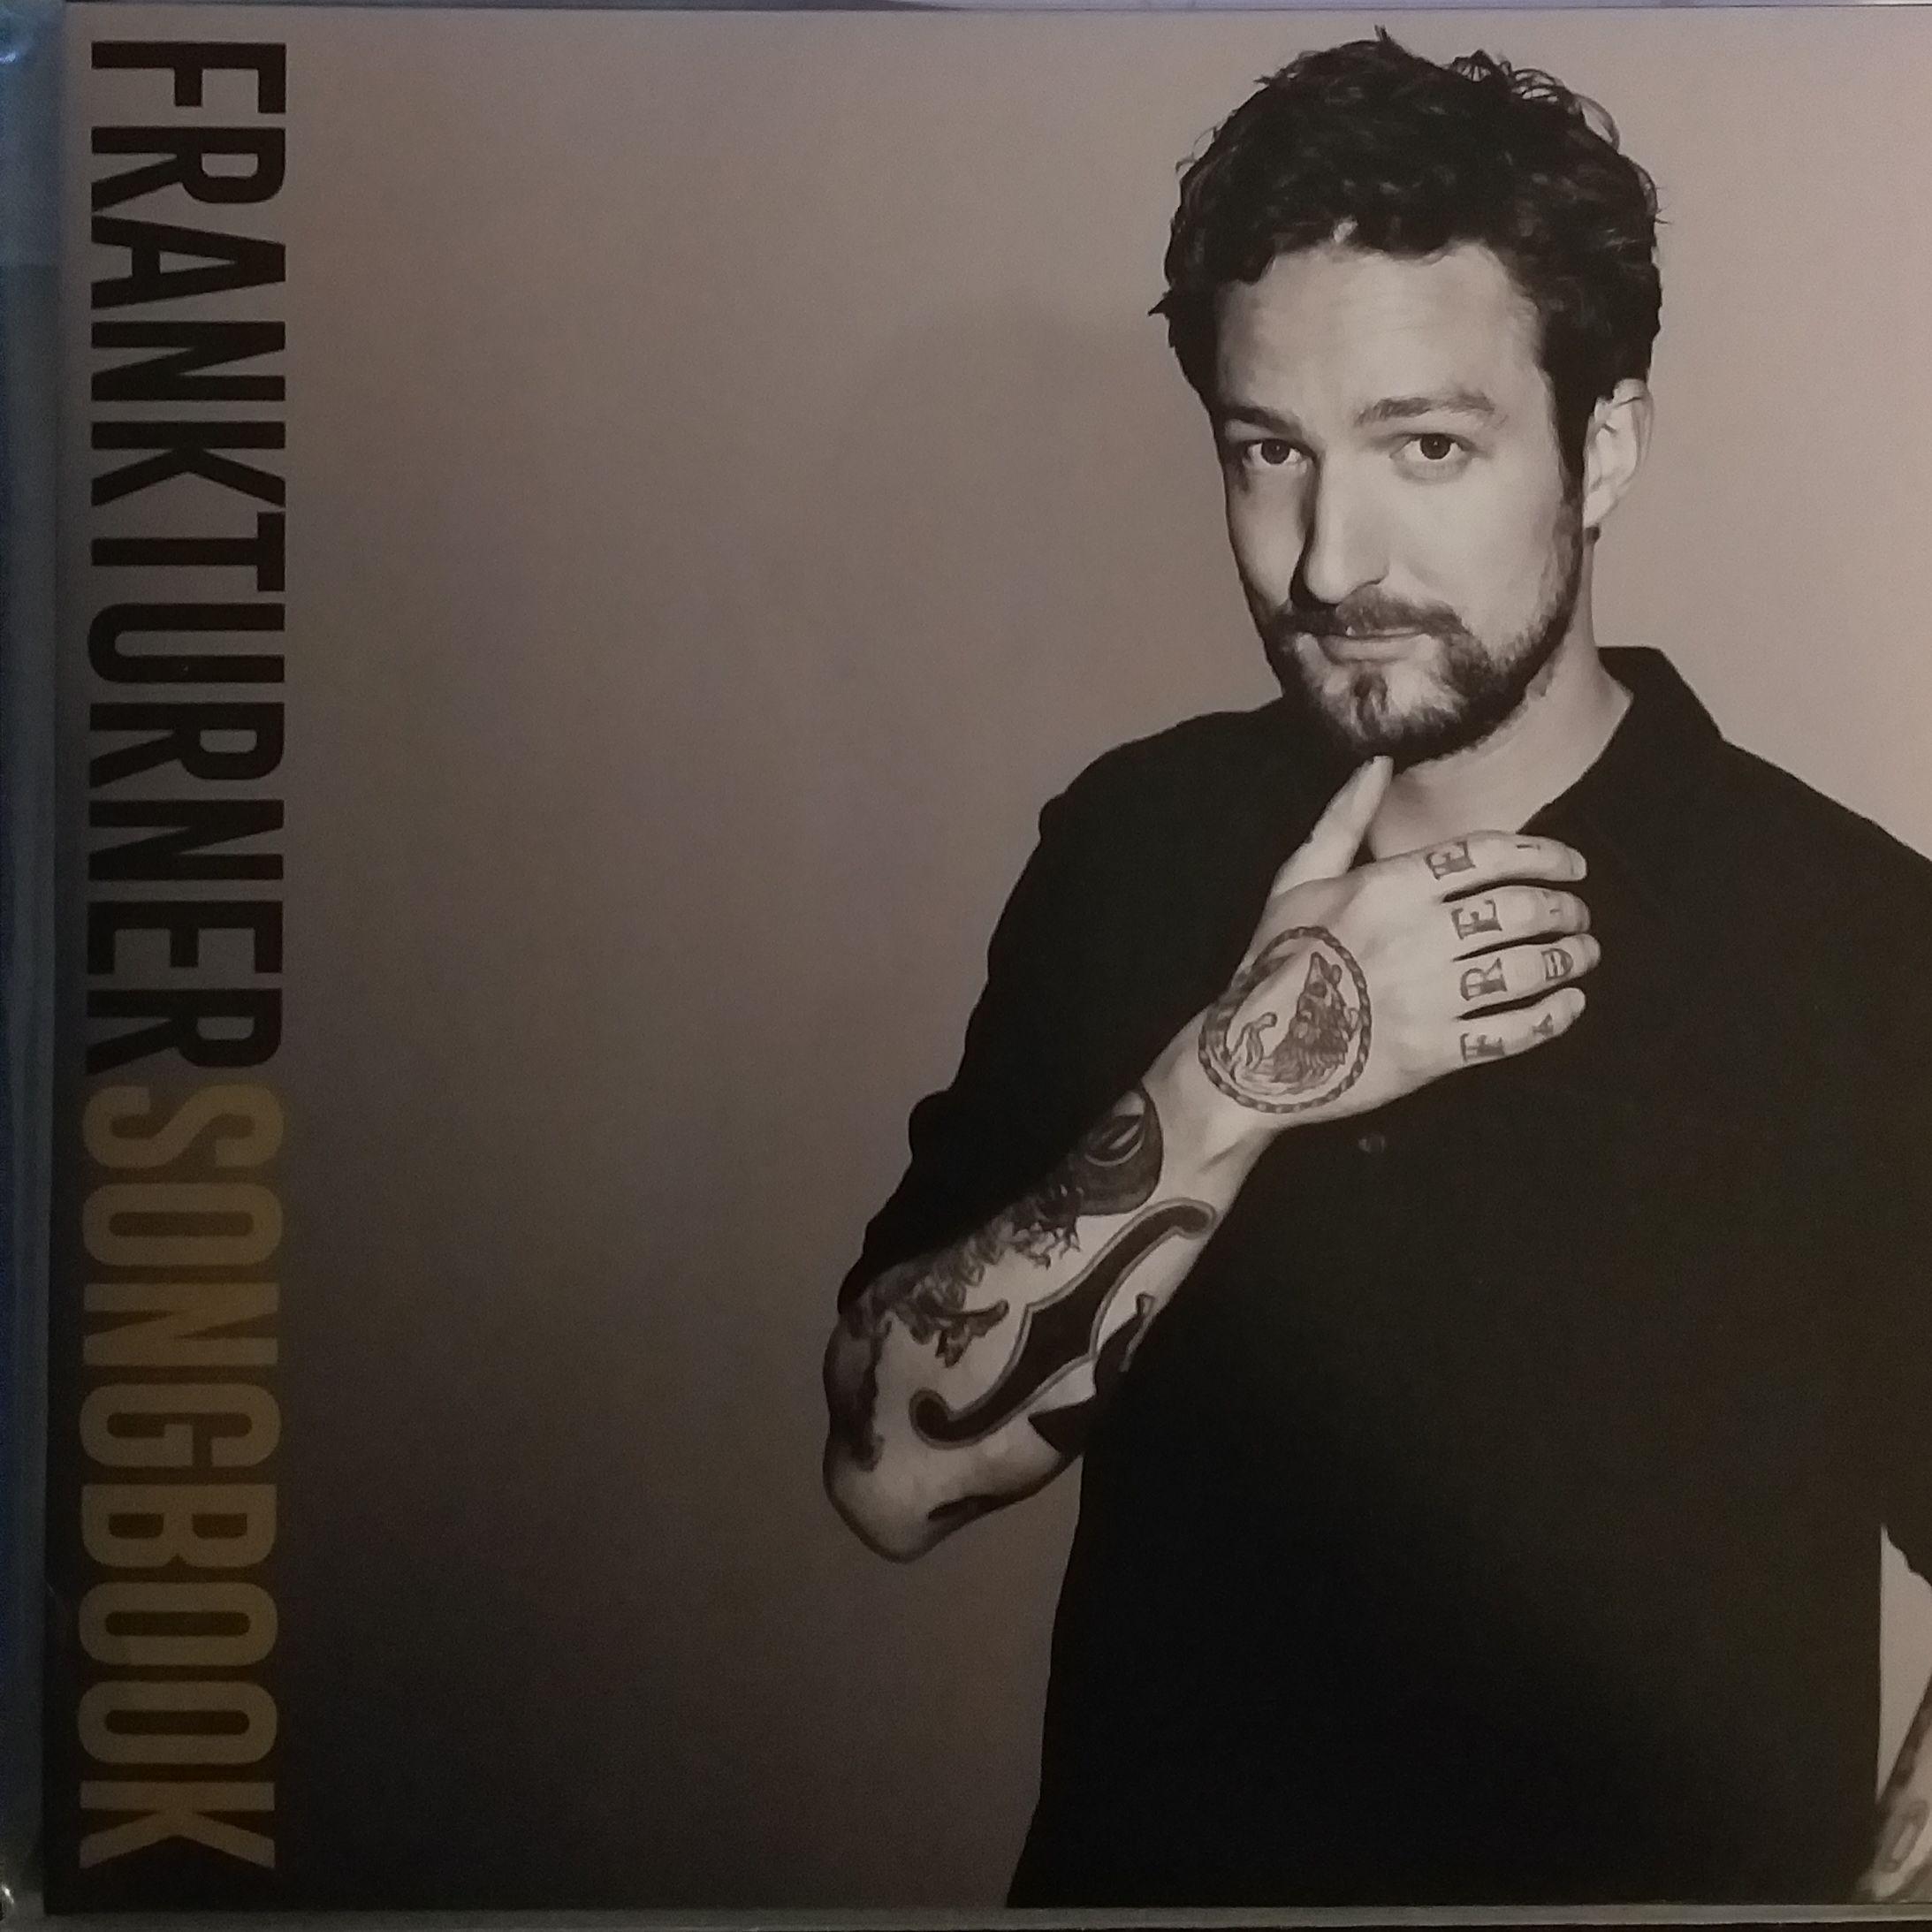 Frank Turner Songbook LP undefined